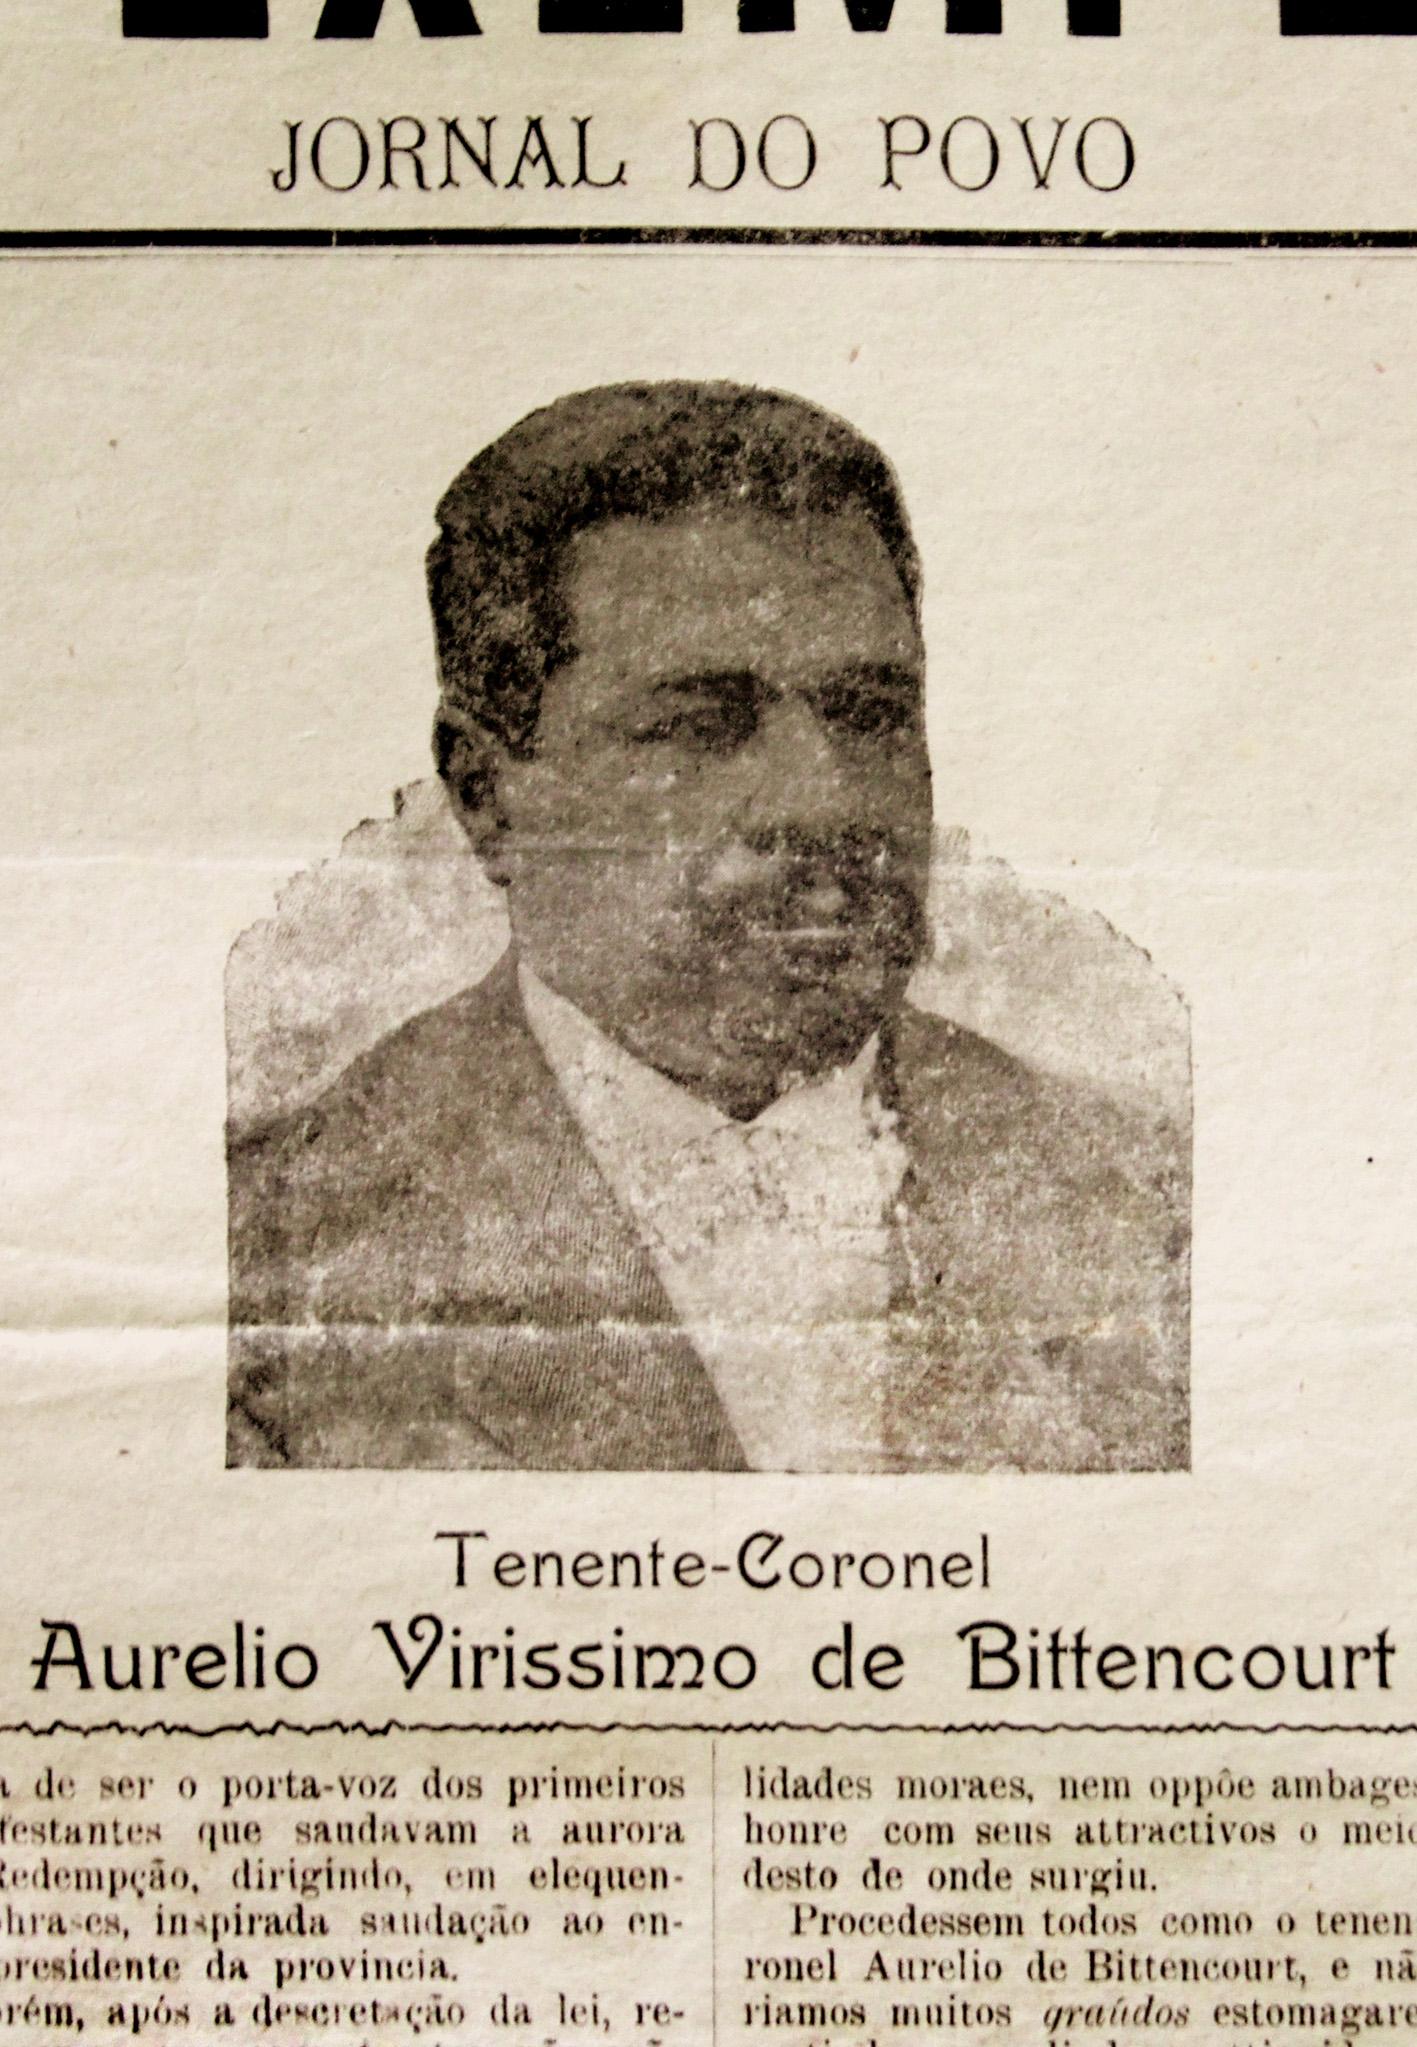 Aurélio Verissimo de Bittencourt The Invisibility of Blacks in one of Brazil's Whitest States